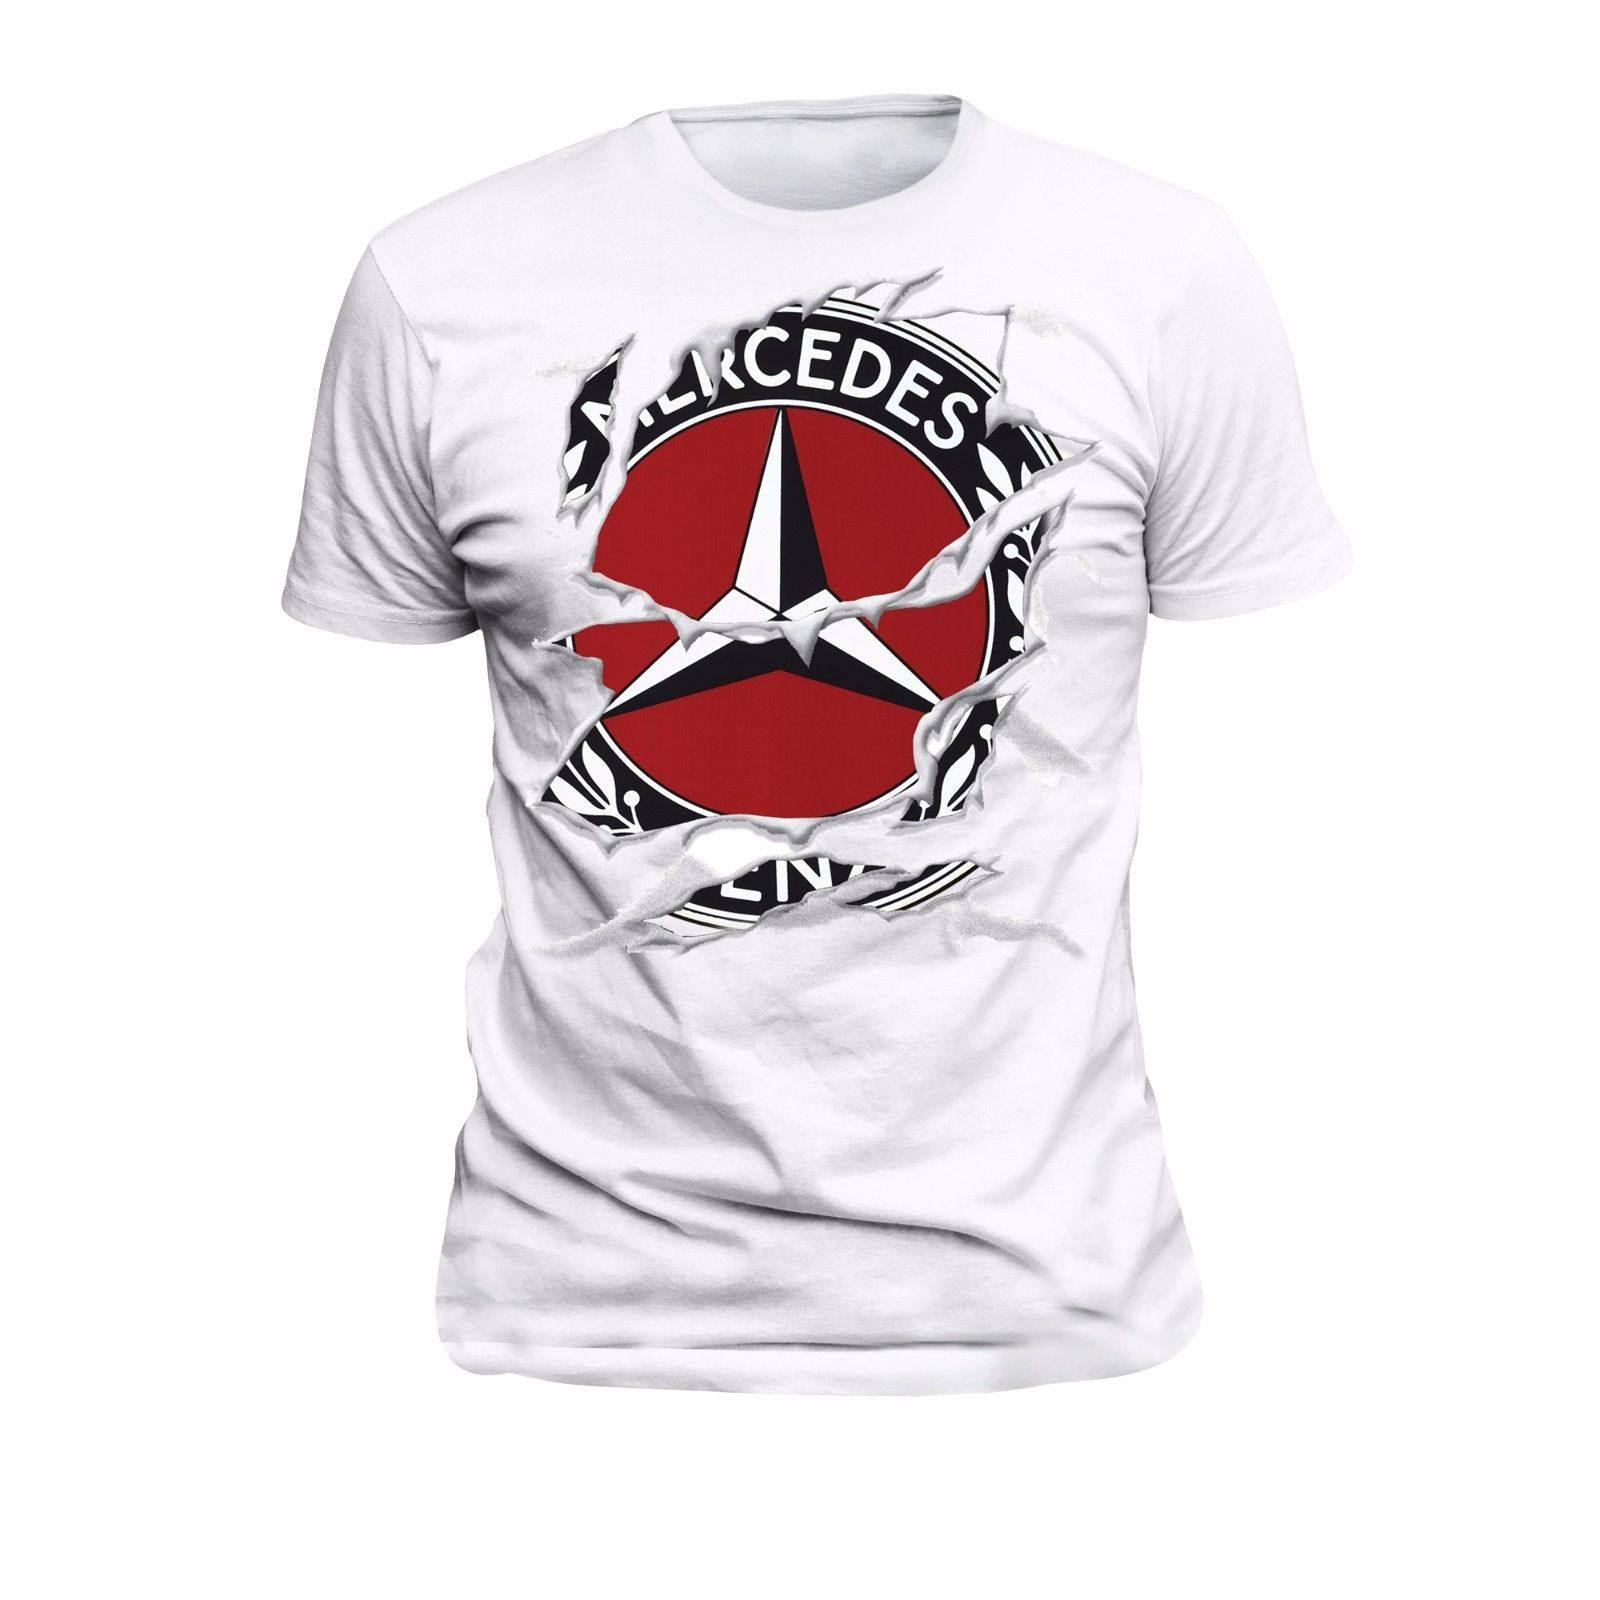 81686cef Online Shop 2019 New Cool Tee Shirt Atari Original Video Game ...